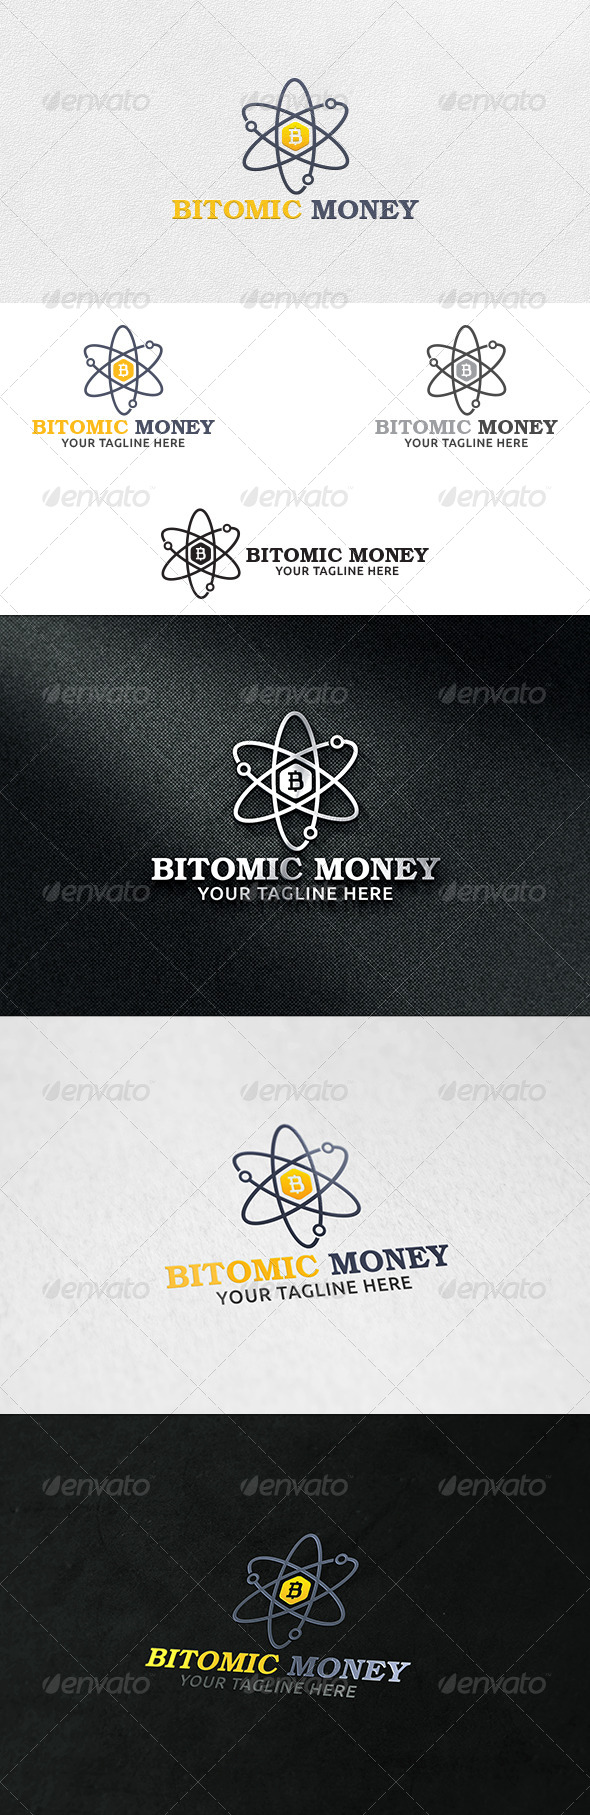 Atomic Money - Logo Template - Symbols Logo Templates